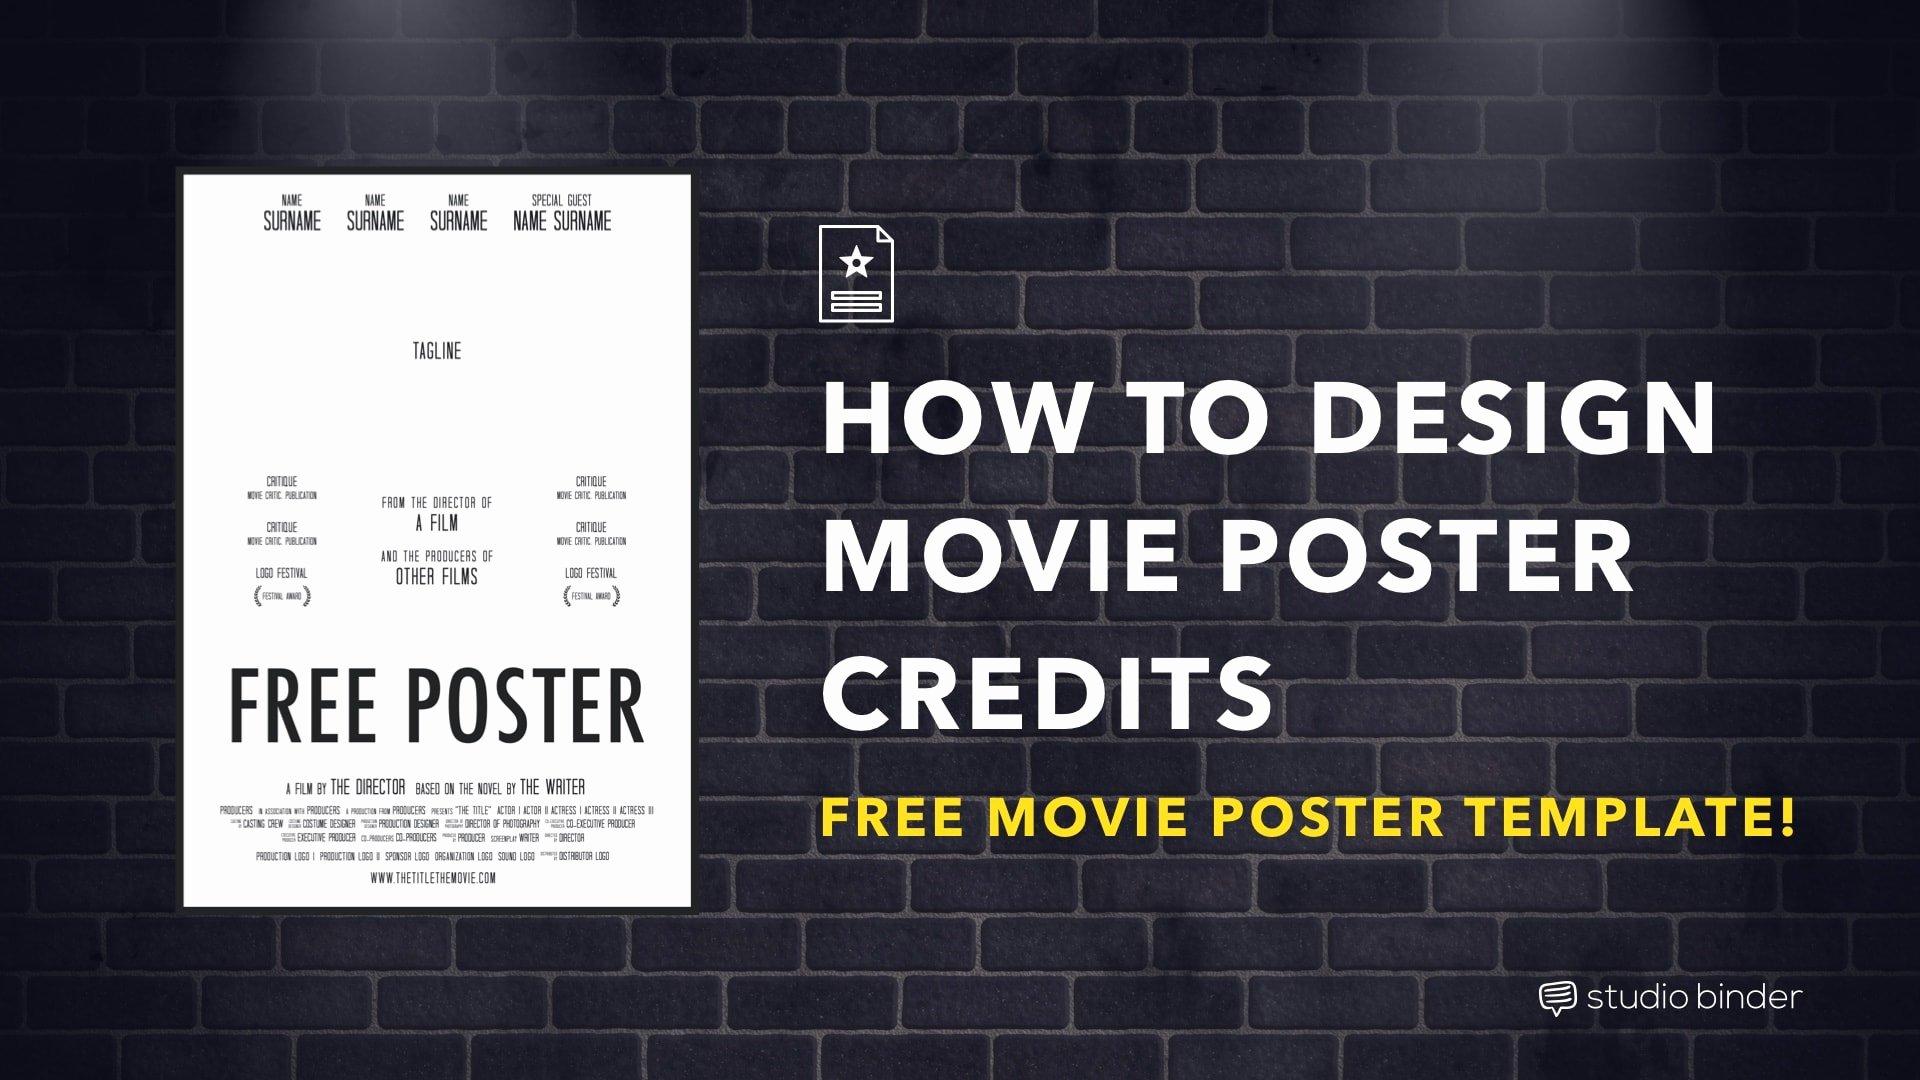 Movie Poster Template Photoshop Luxury Download Your Free Movie Poster Template for Shop